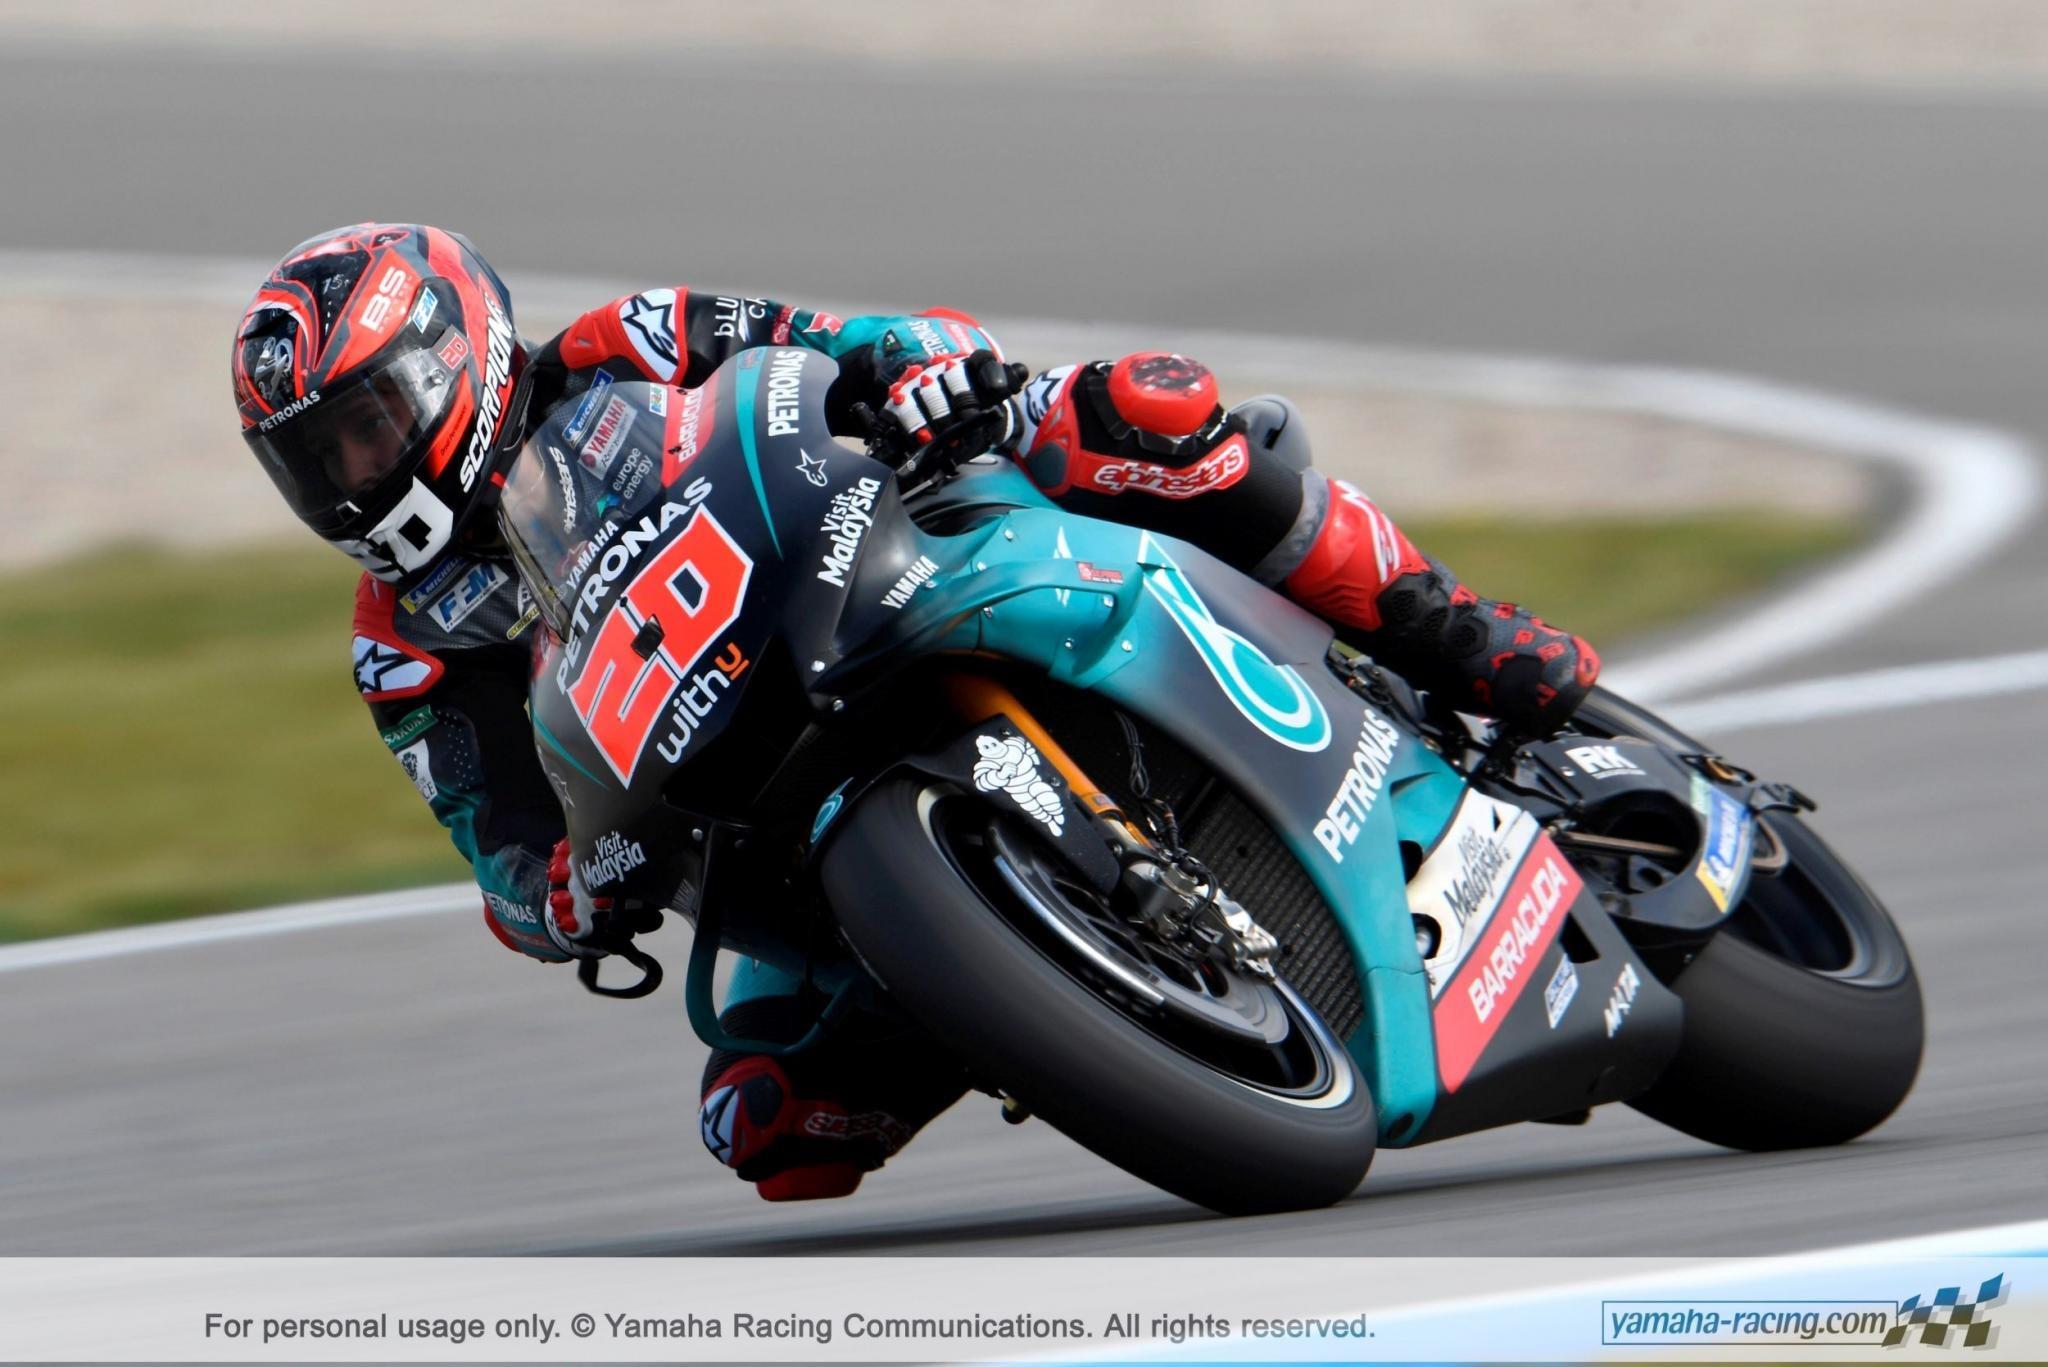 Fahrer Motogp 2021